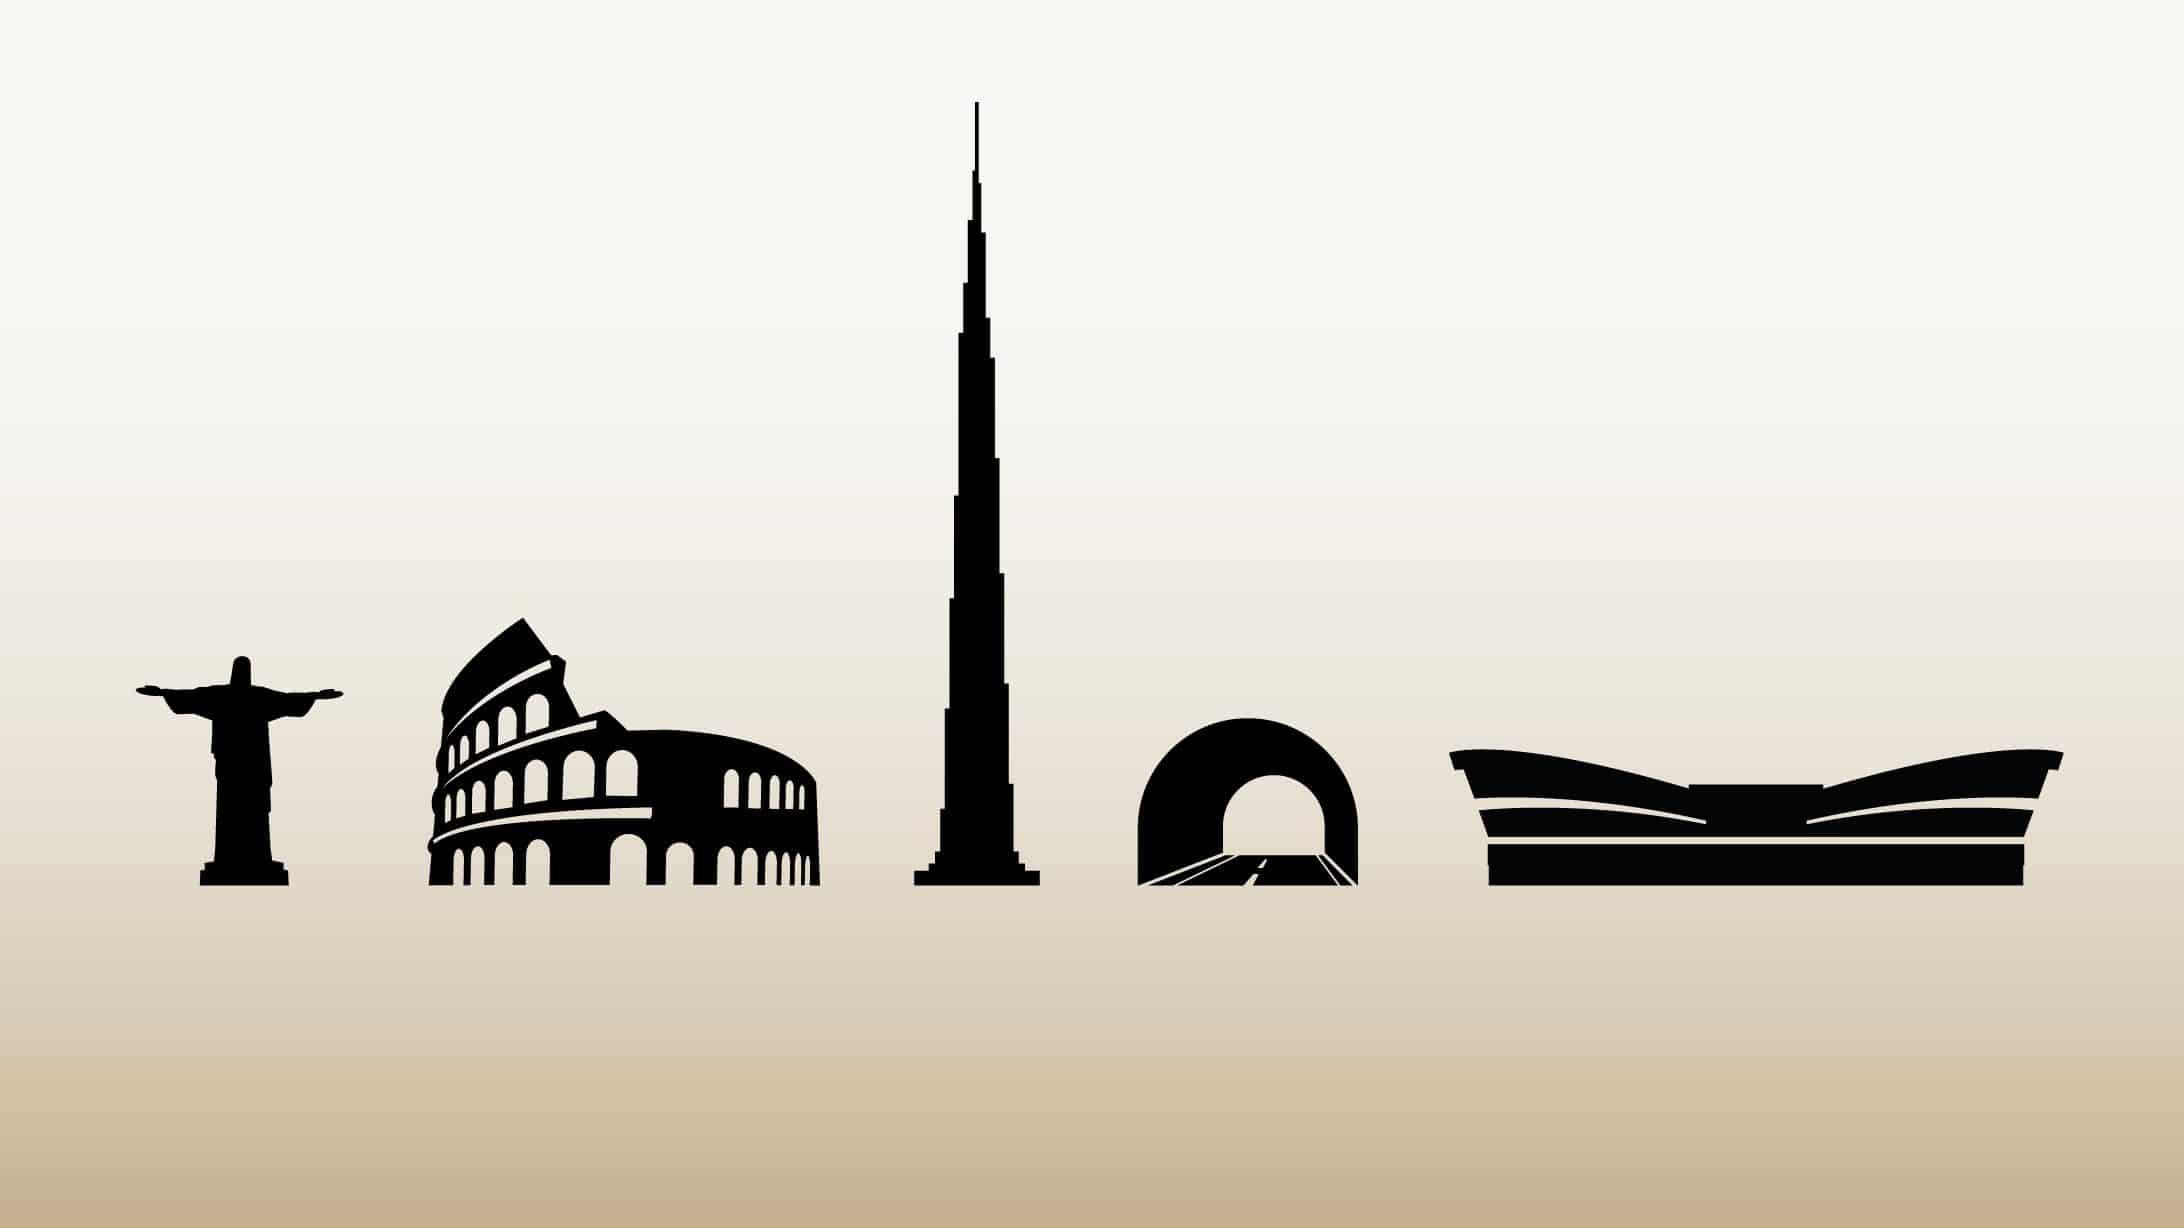 Infografik mit verschiedenen Bauten